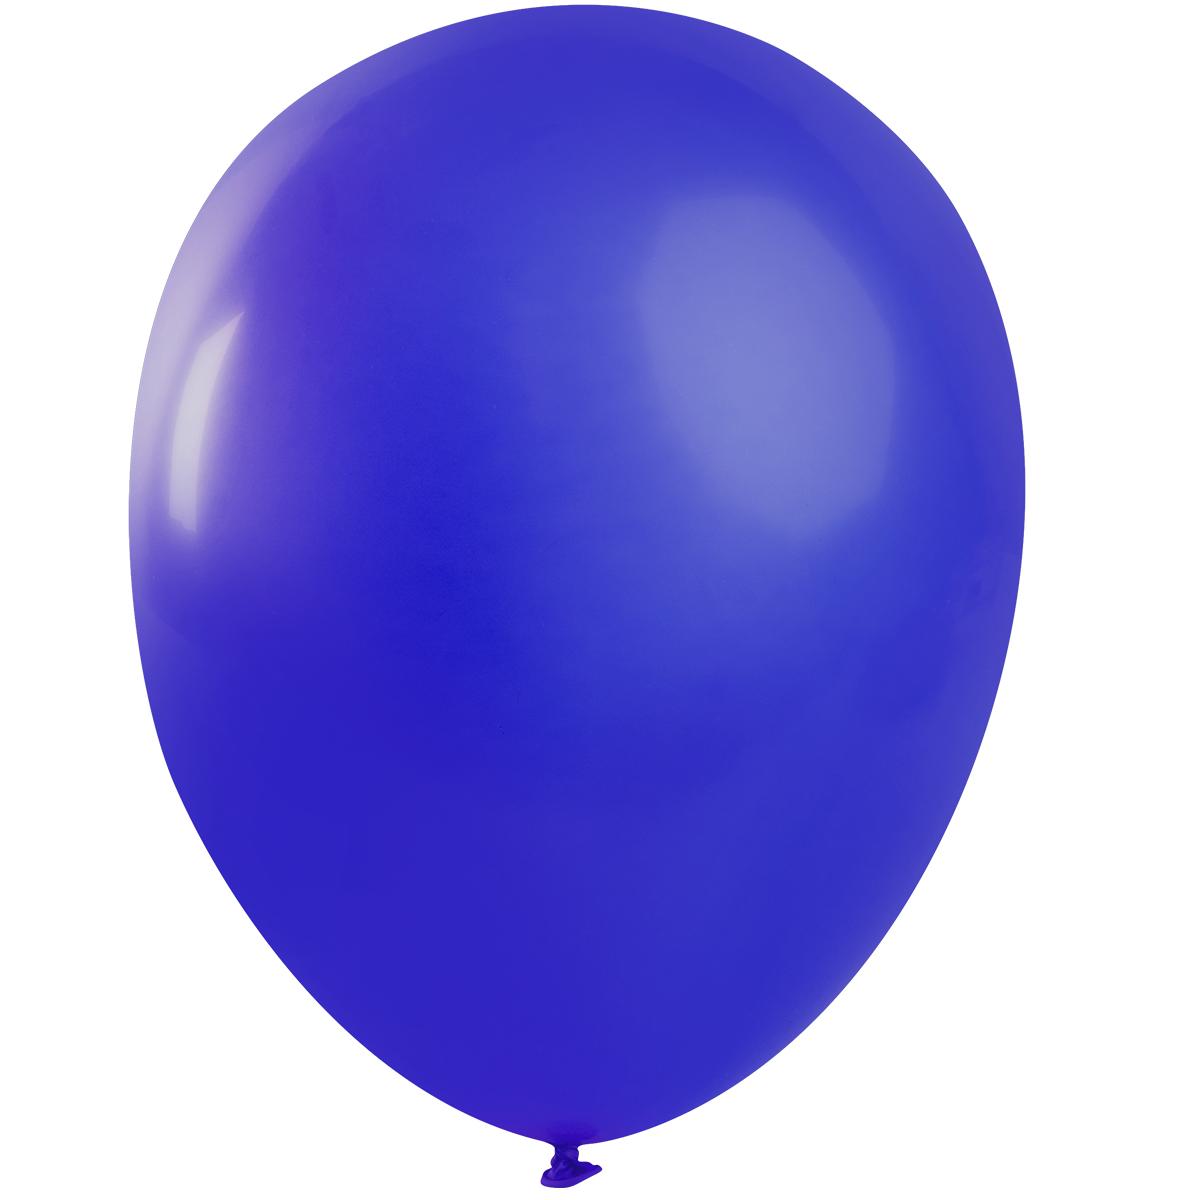 Ballong lösvikt, Mörkblå